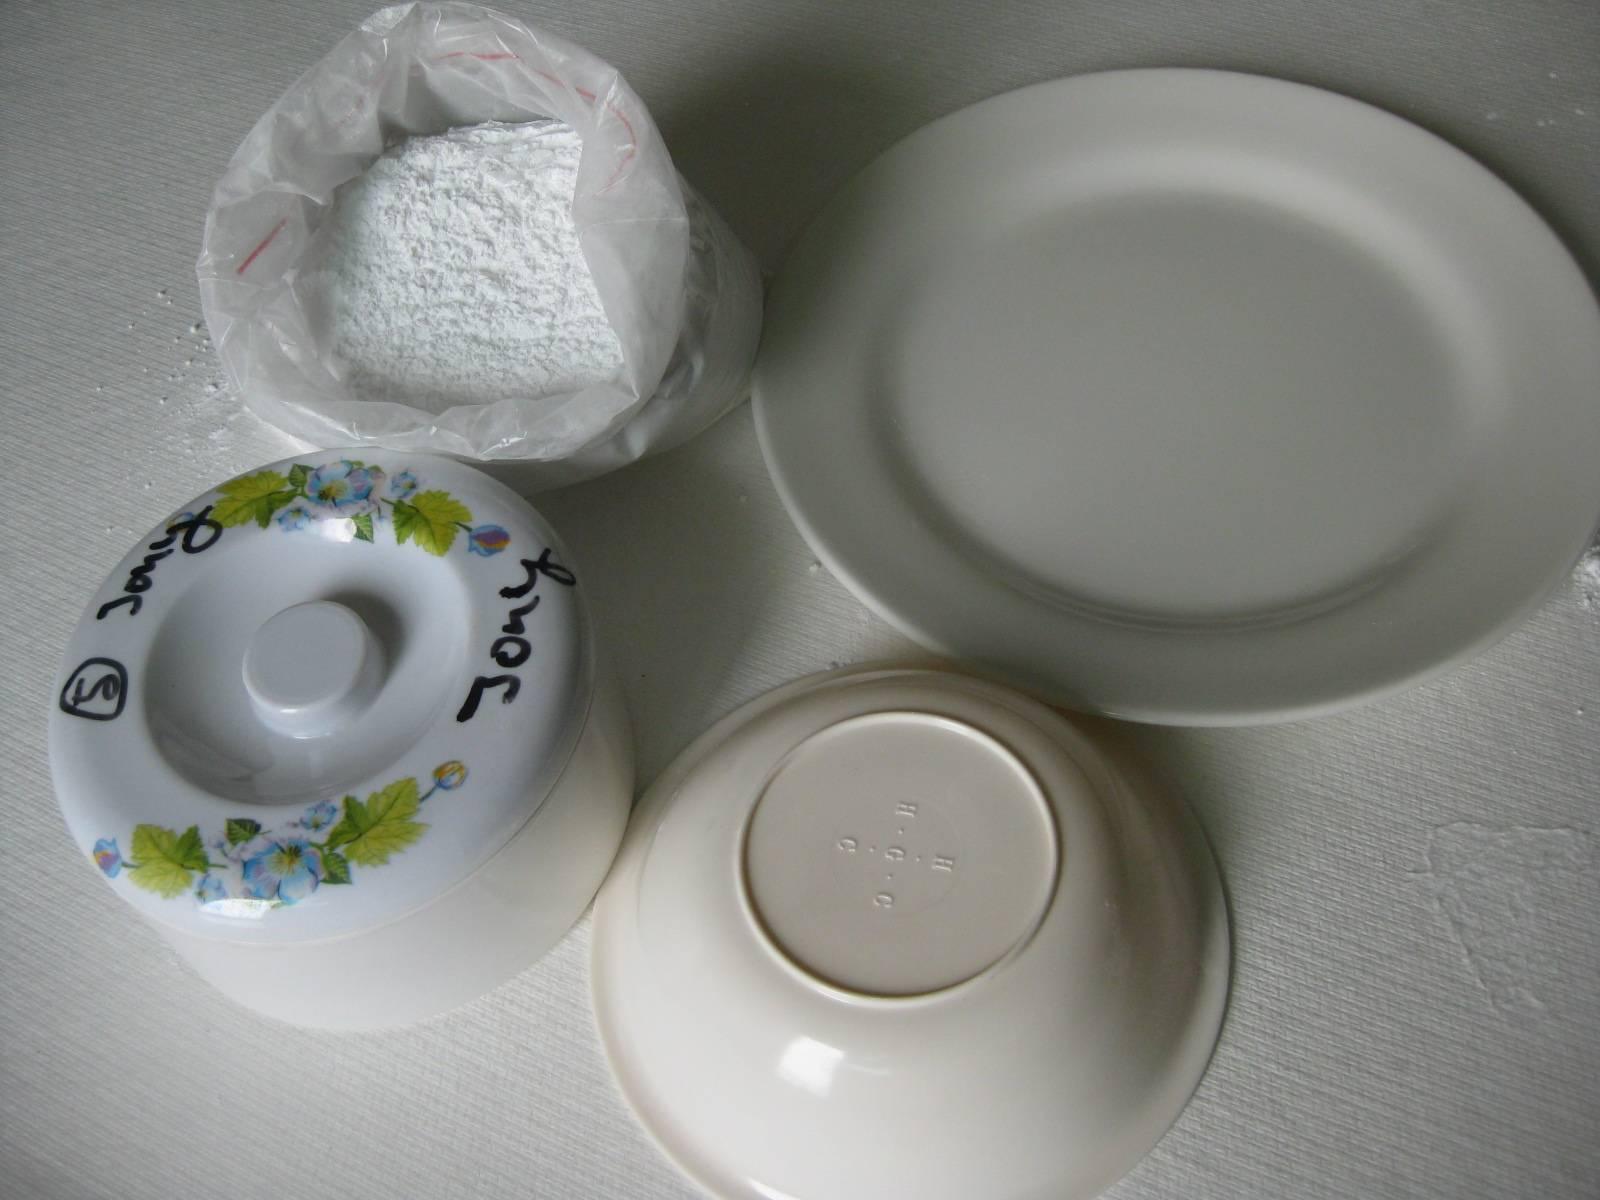 Melamine formaldehyde resin powder